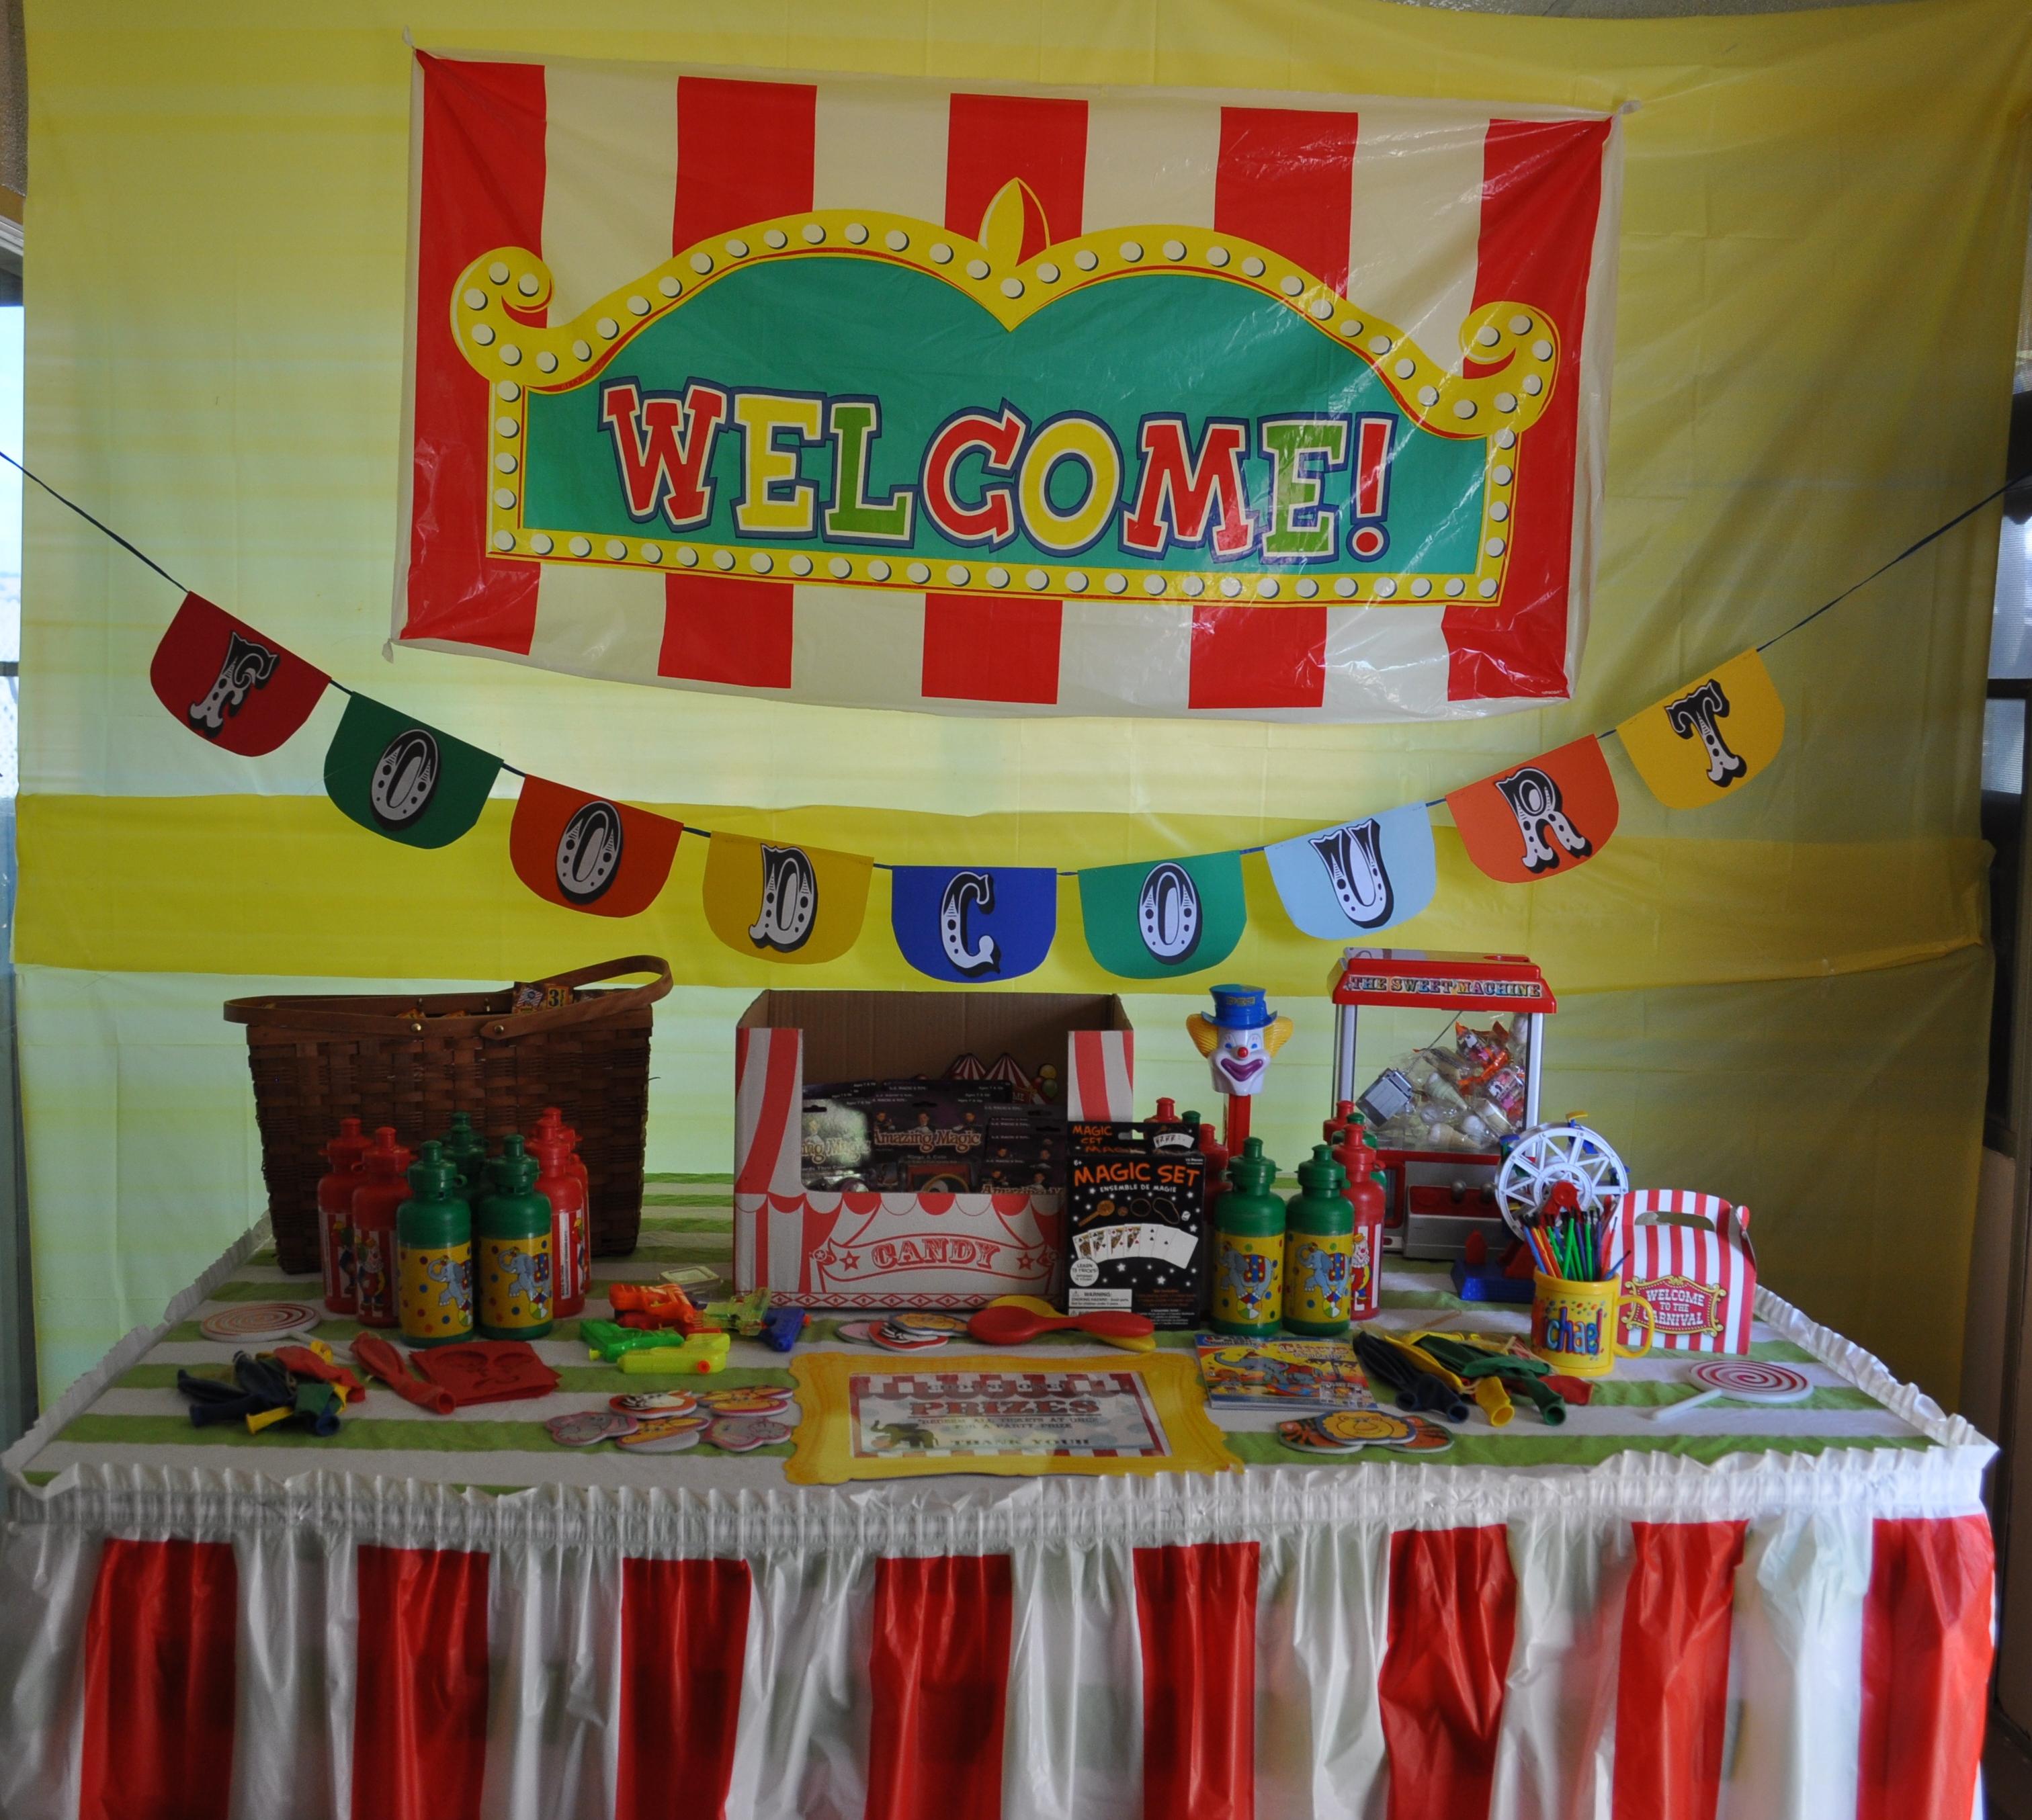 15.party on a budget backyard carnival party via SIMPHOME.COM